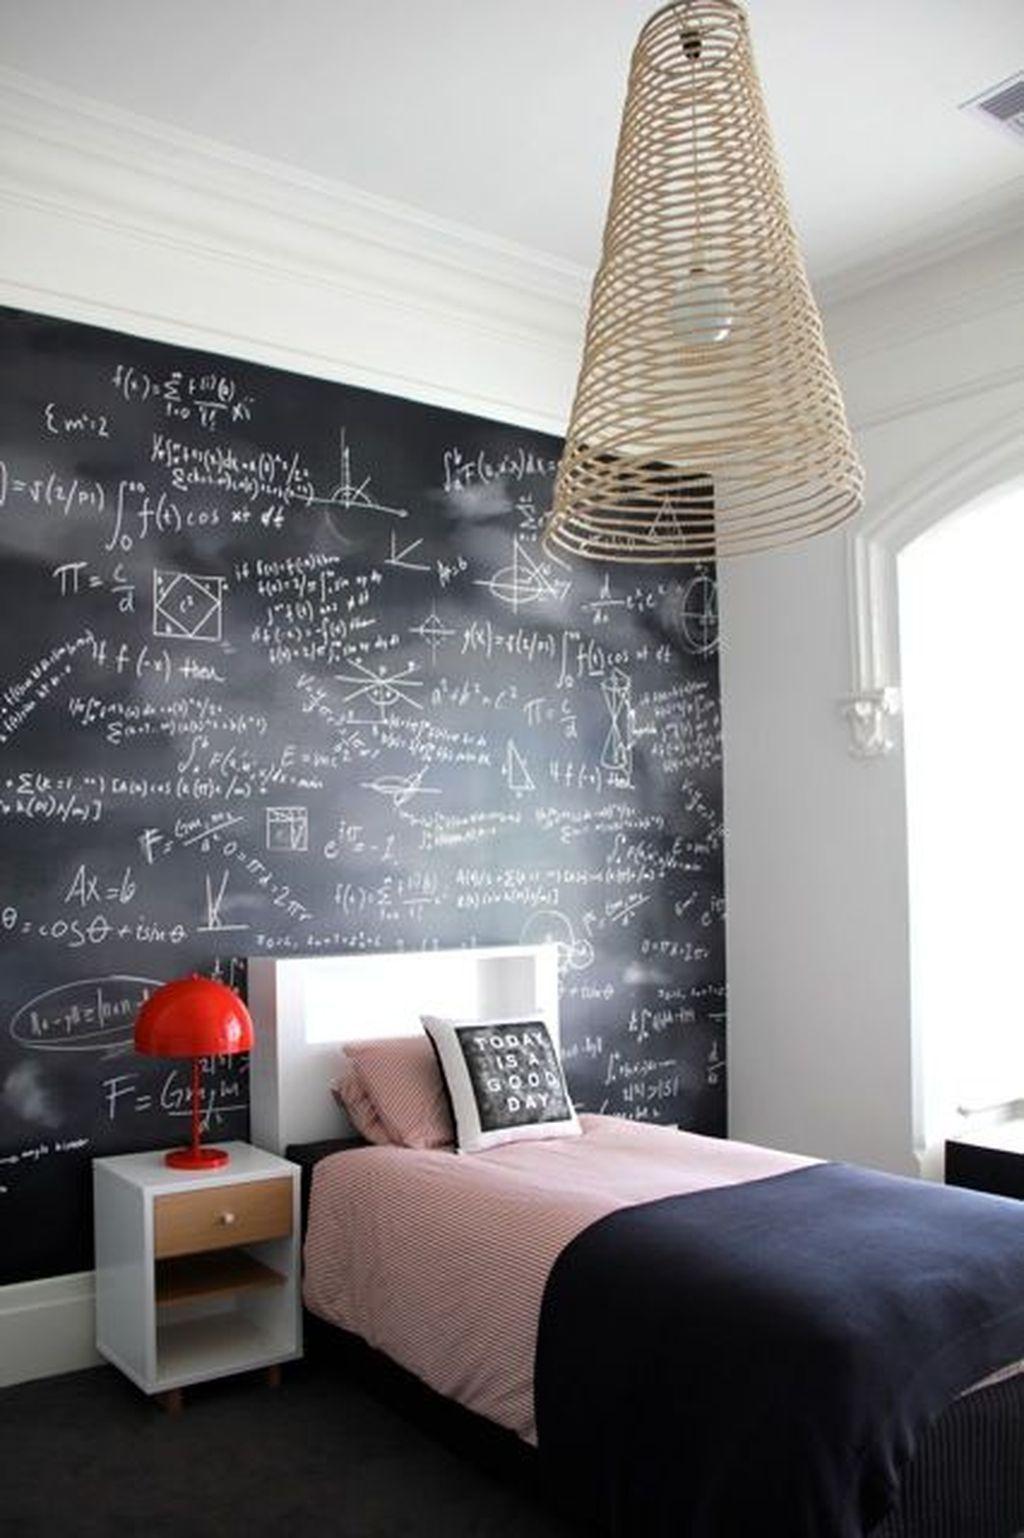 Loft bedroom ideas for teenage girls  bunk beds bedroom sets bedroom furniture kids beds bedroom ideas